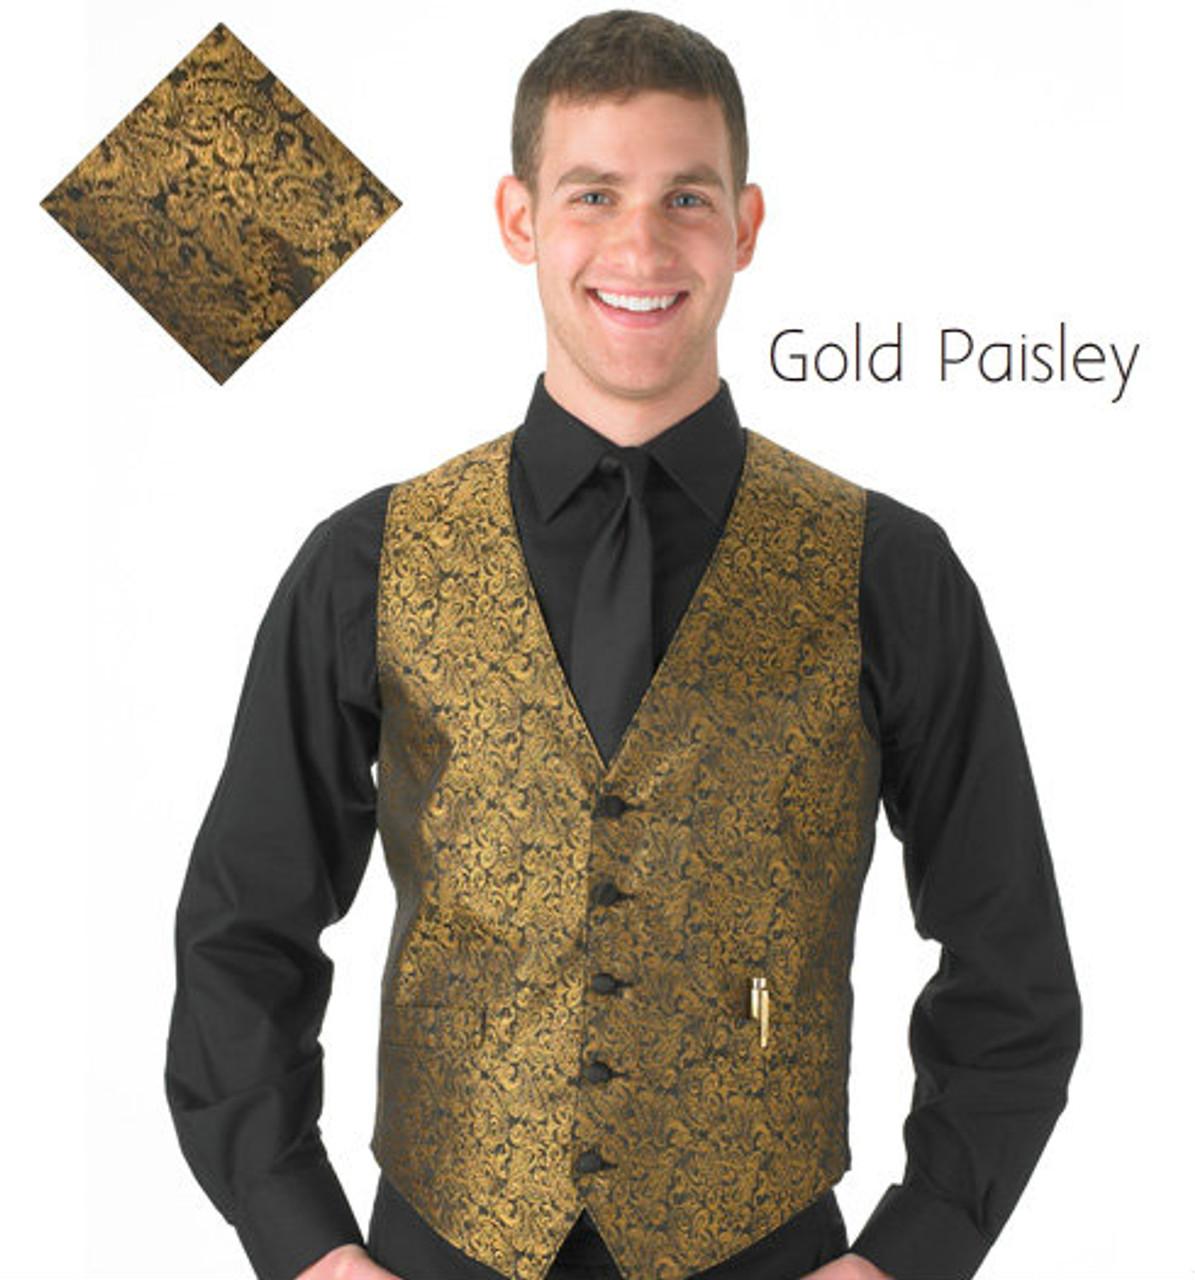 Gold Paisley